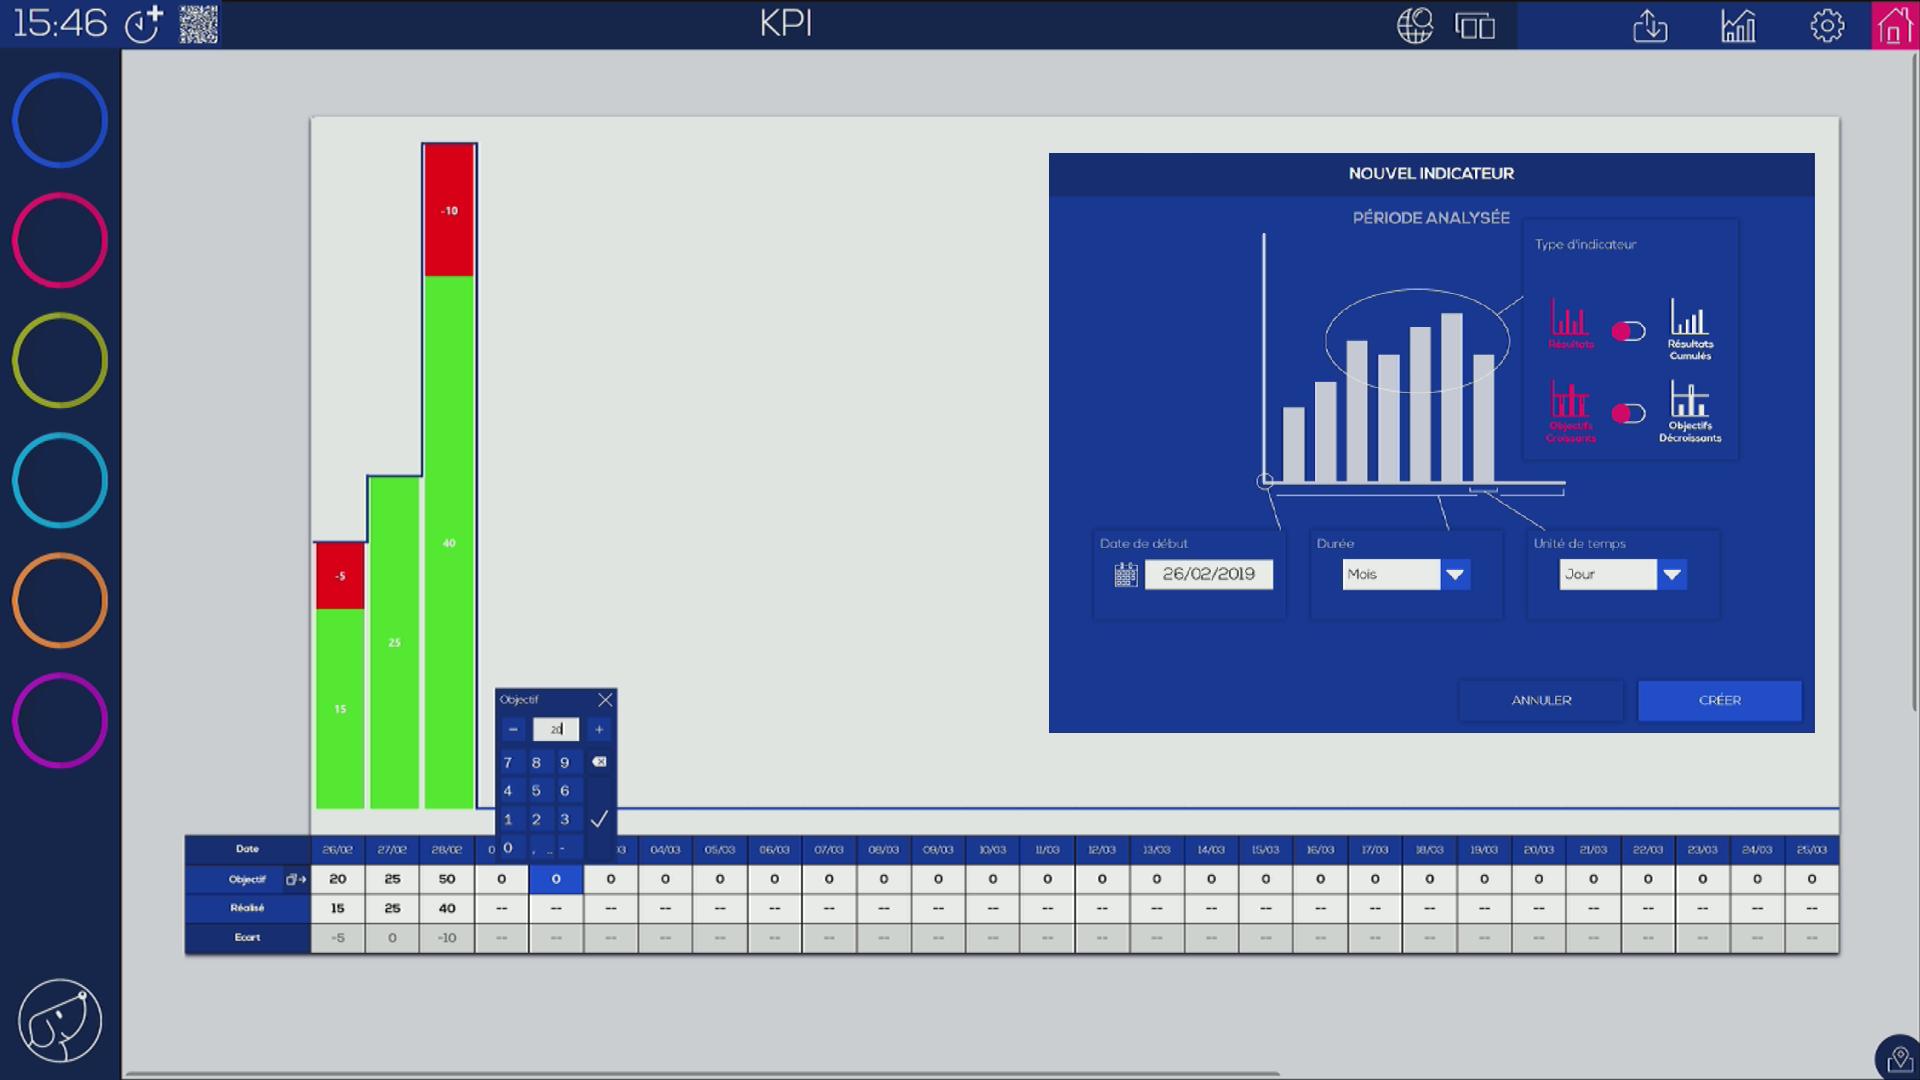 ubikey-KPI